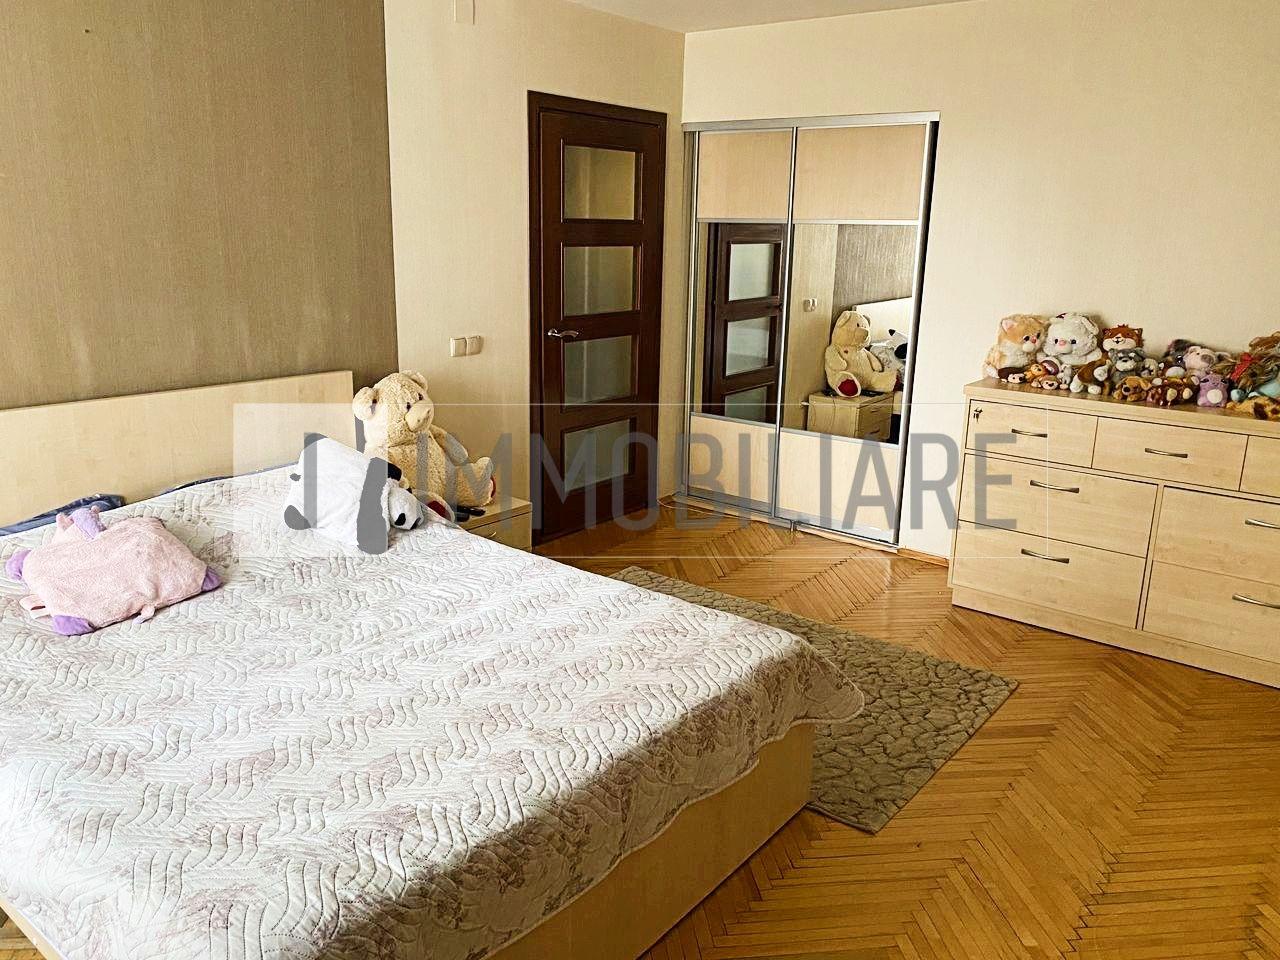 Apartament cu 2 camere, sect. Rîșcani, bd Moscova.